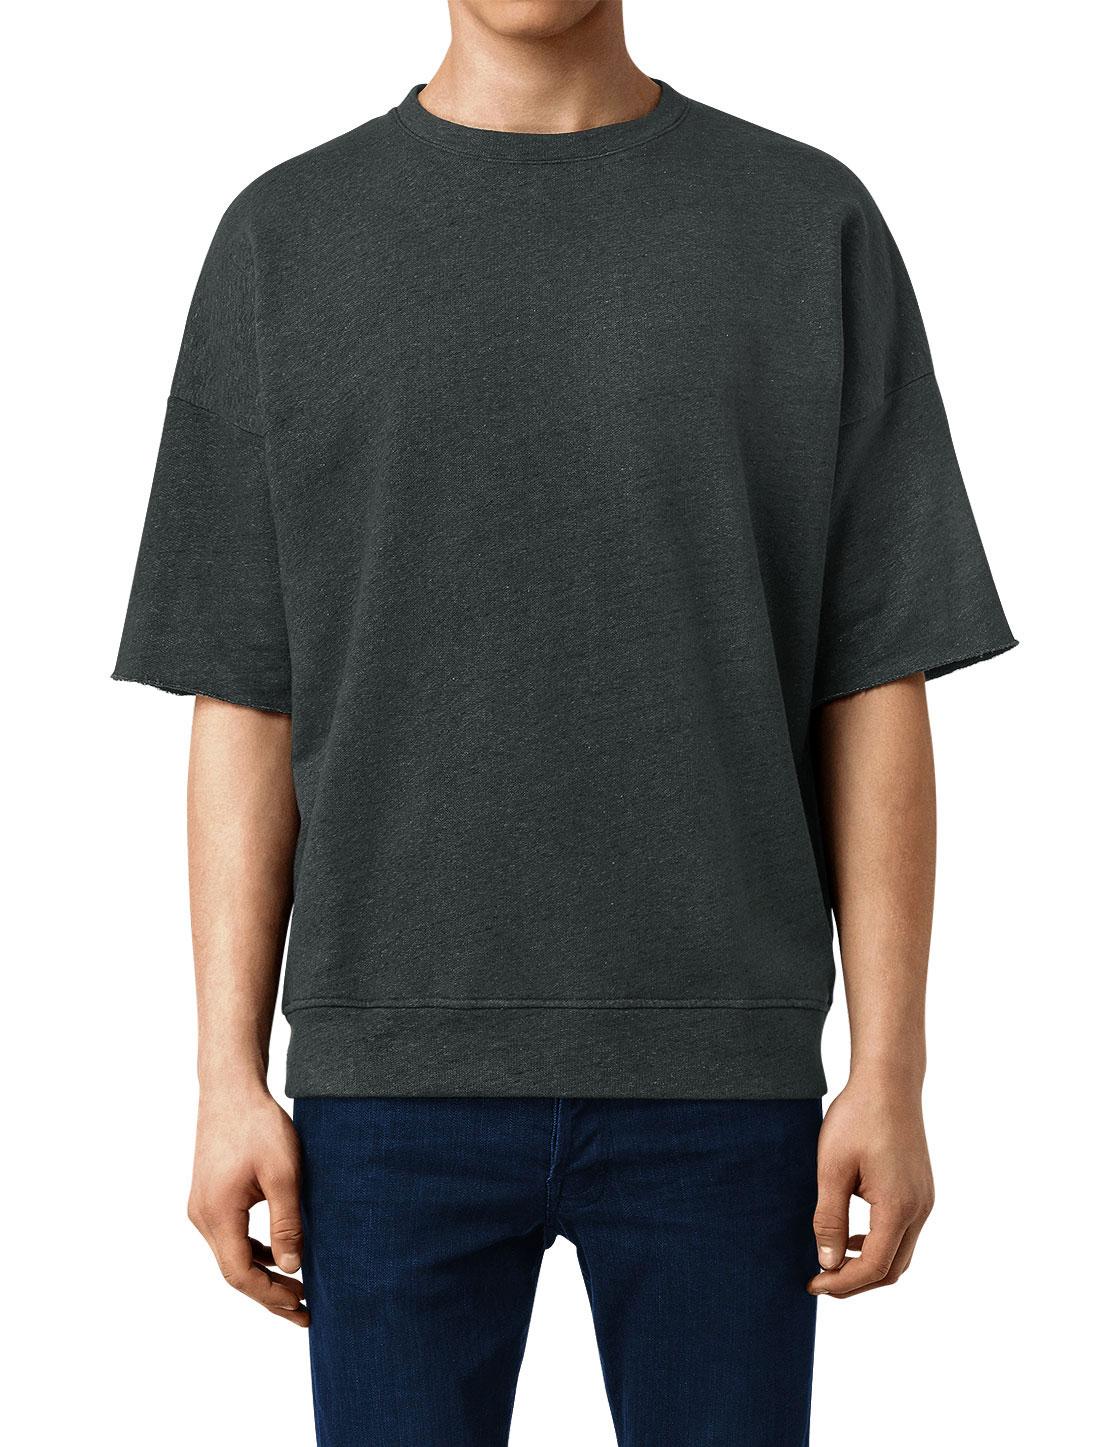 Man Short Sleeved Drop-Shoulder Crew Neck Tee Shirt Dark Gray M